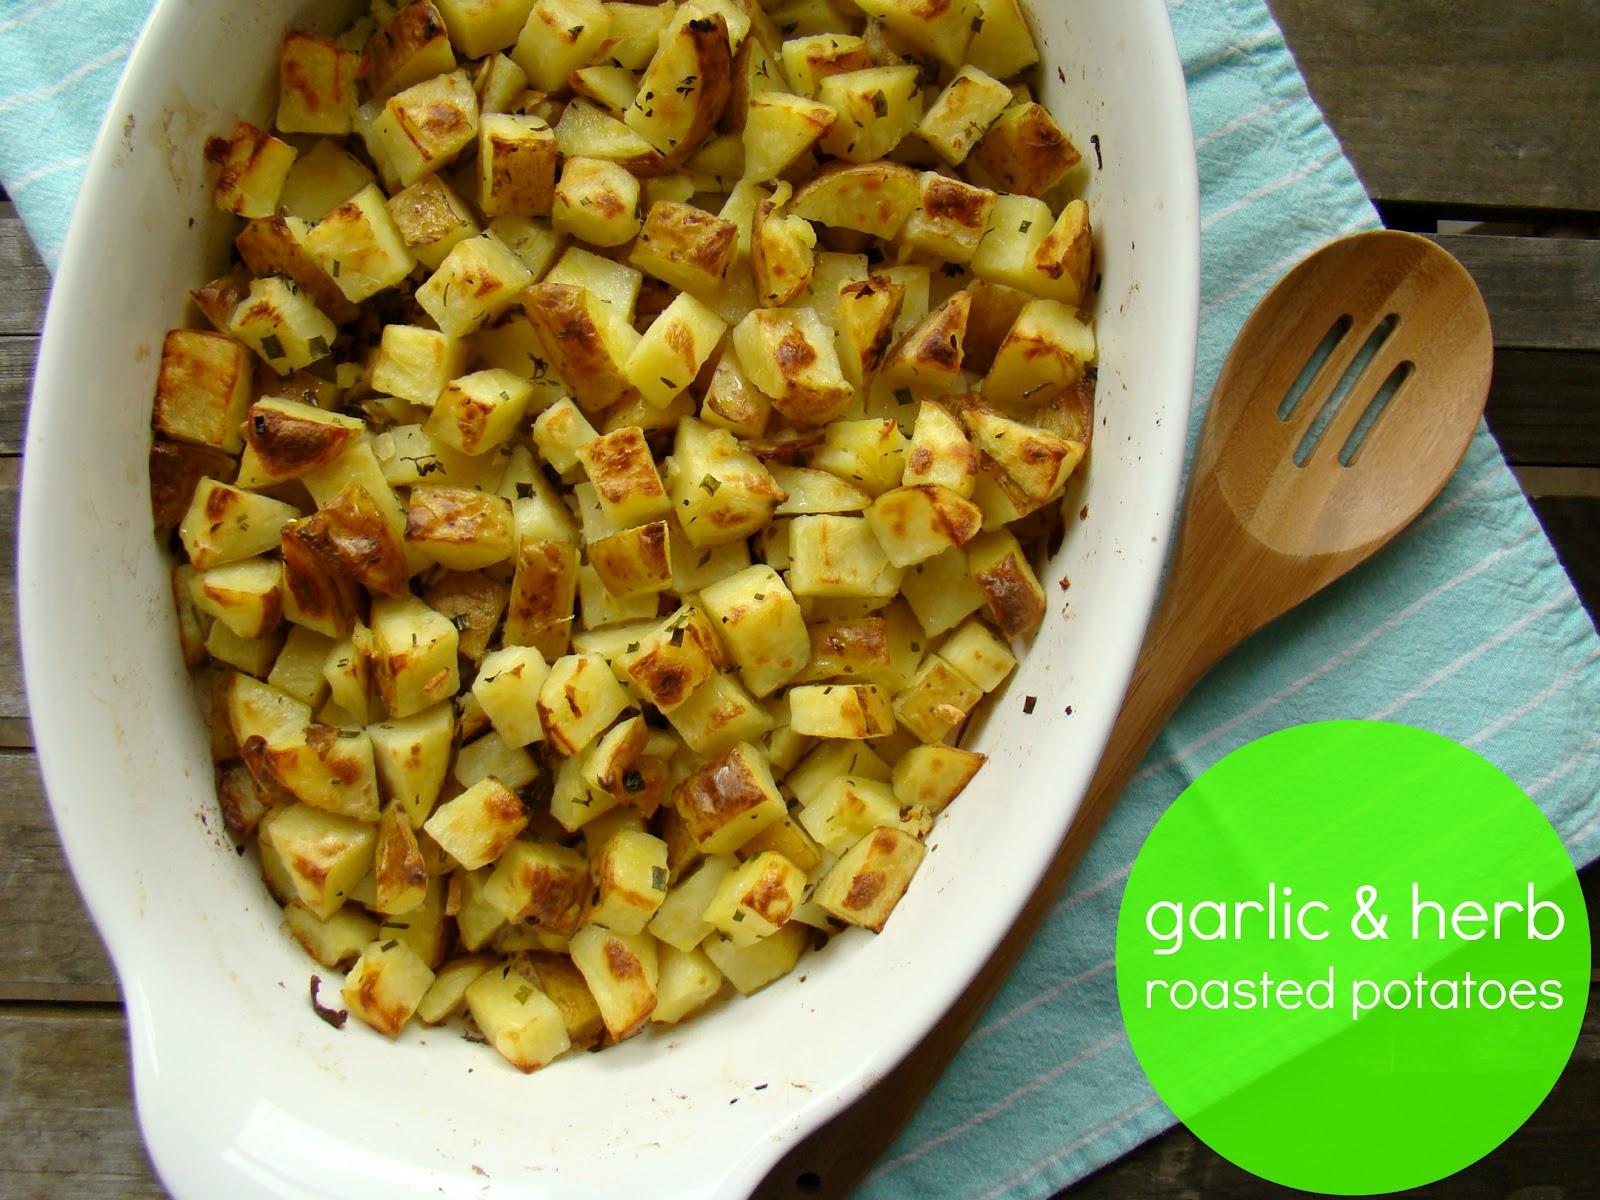 Family Feedbag: Garlic & herb roasted potatoes